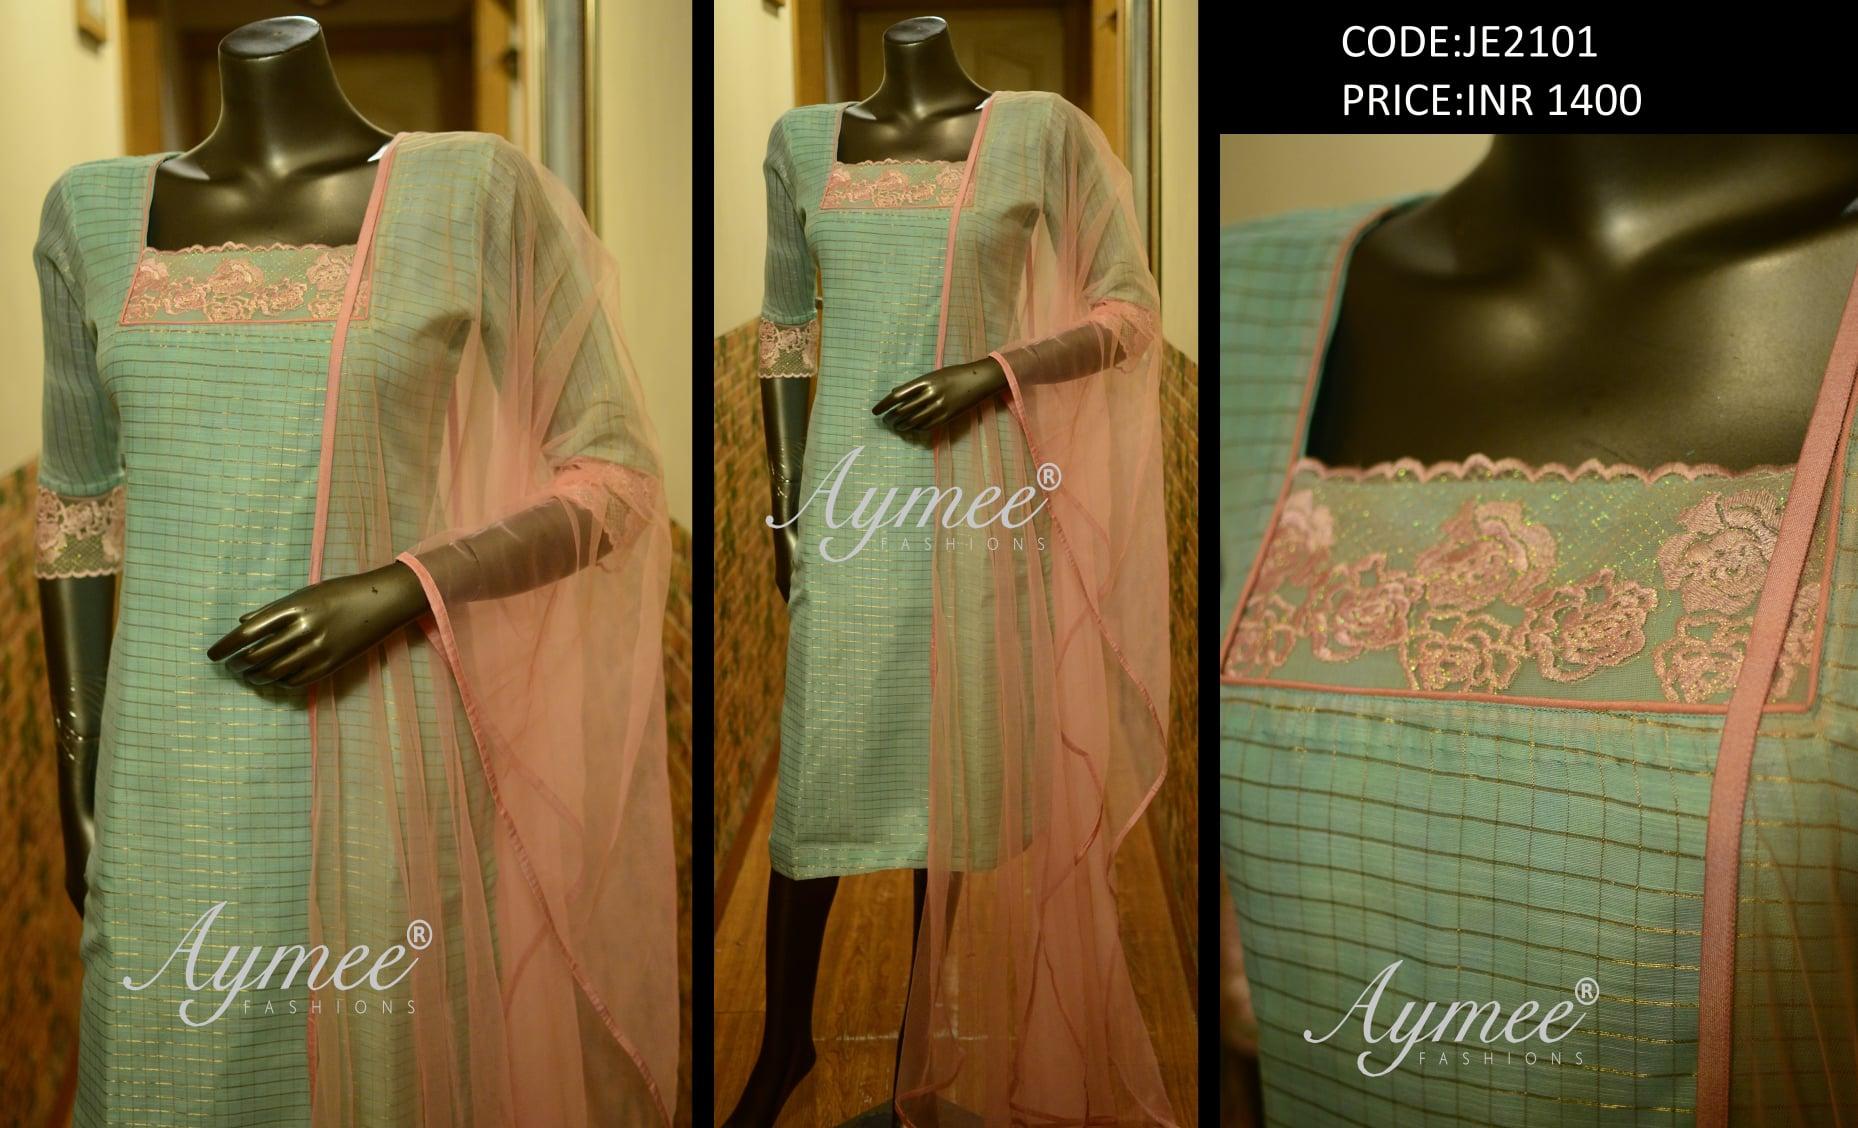 Semi stitched TOP and dupatta(Size upto 42) (CODE:JE2101) Material - Top-Chanderi silk Dupatta-Net NO BOTTOM 2021-06-16